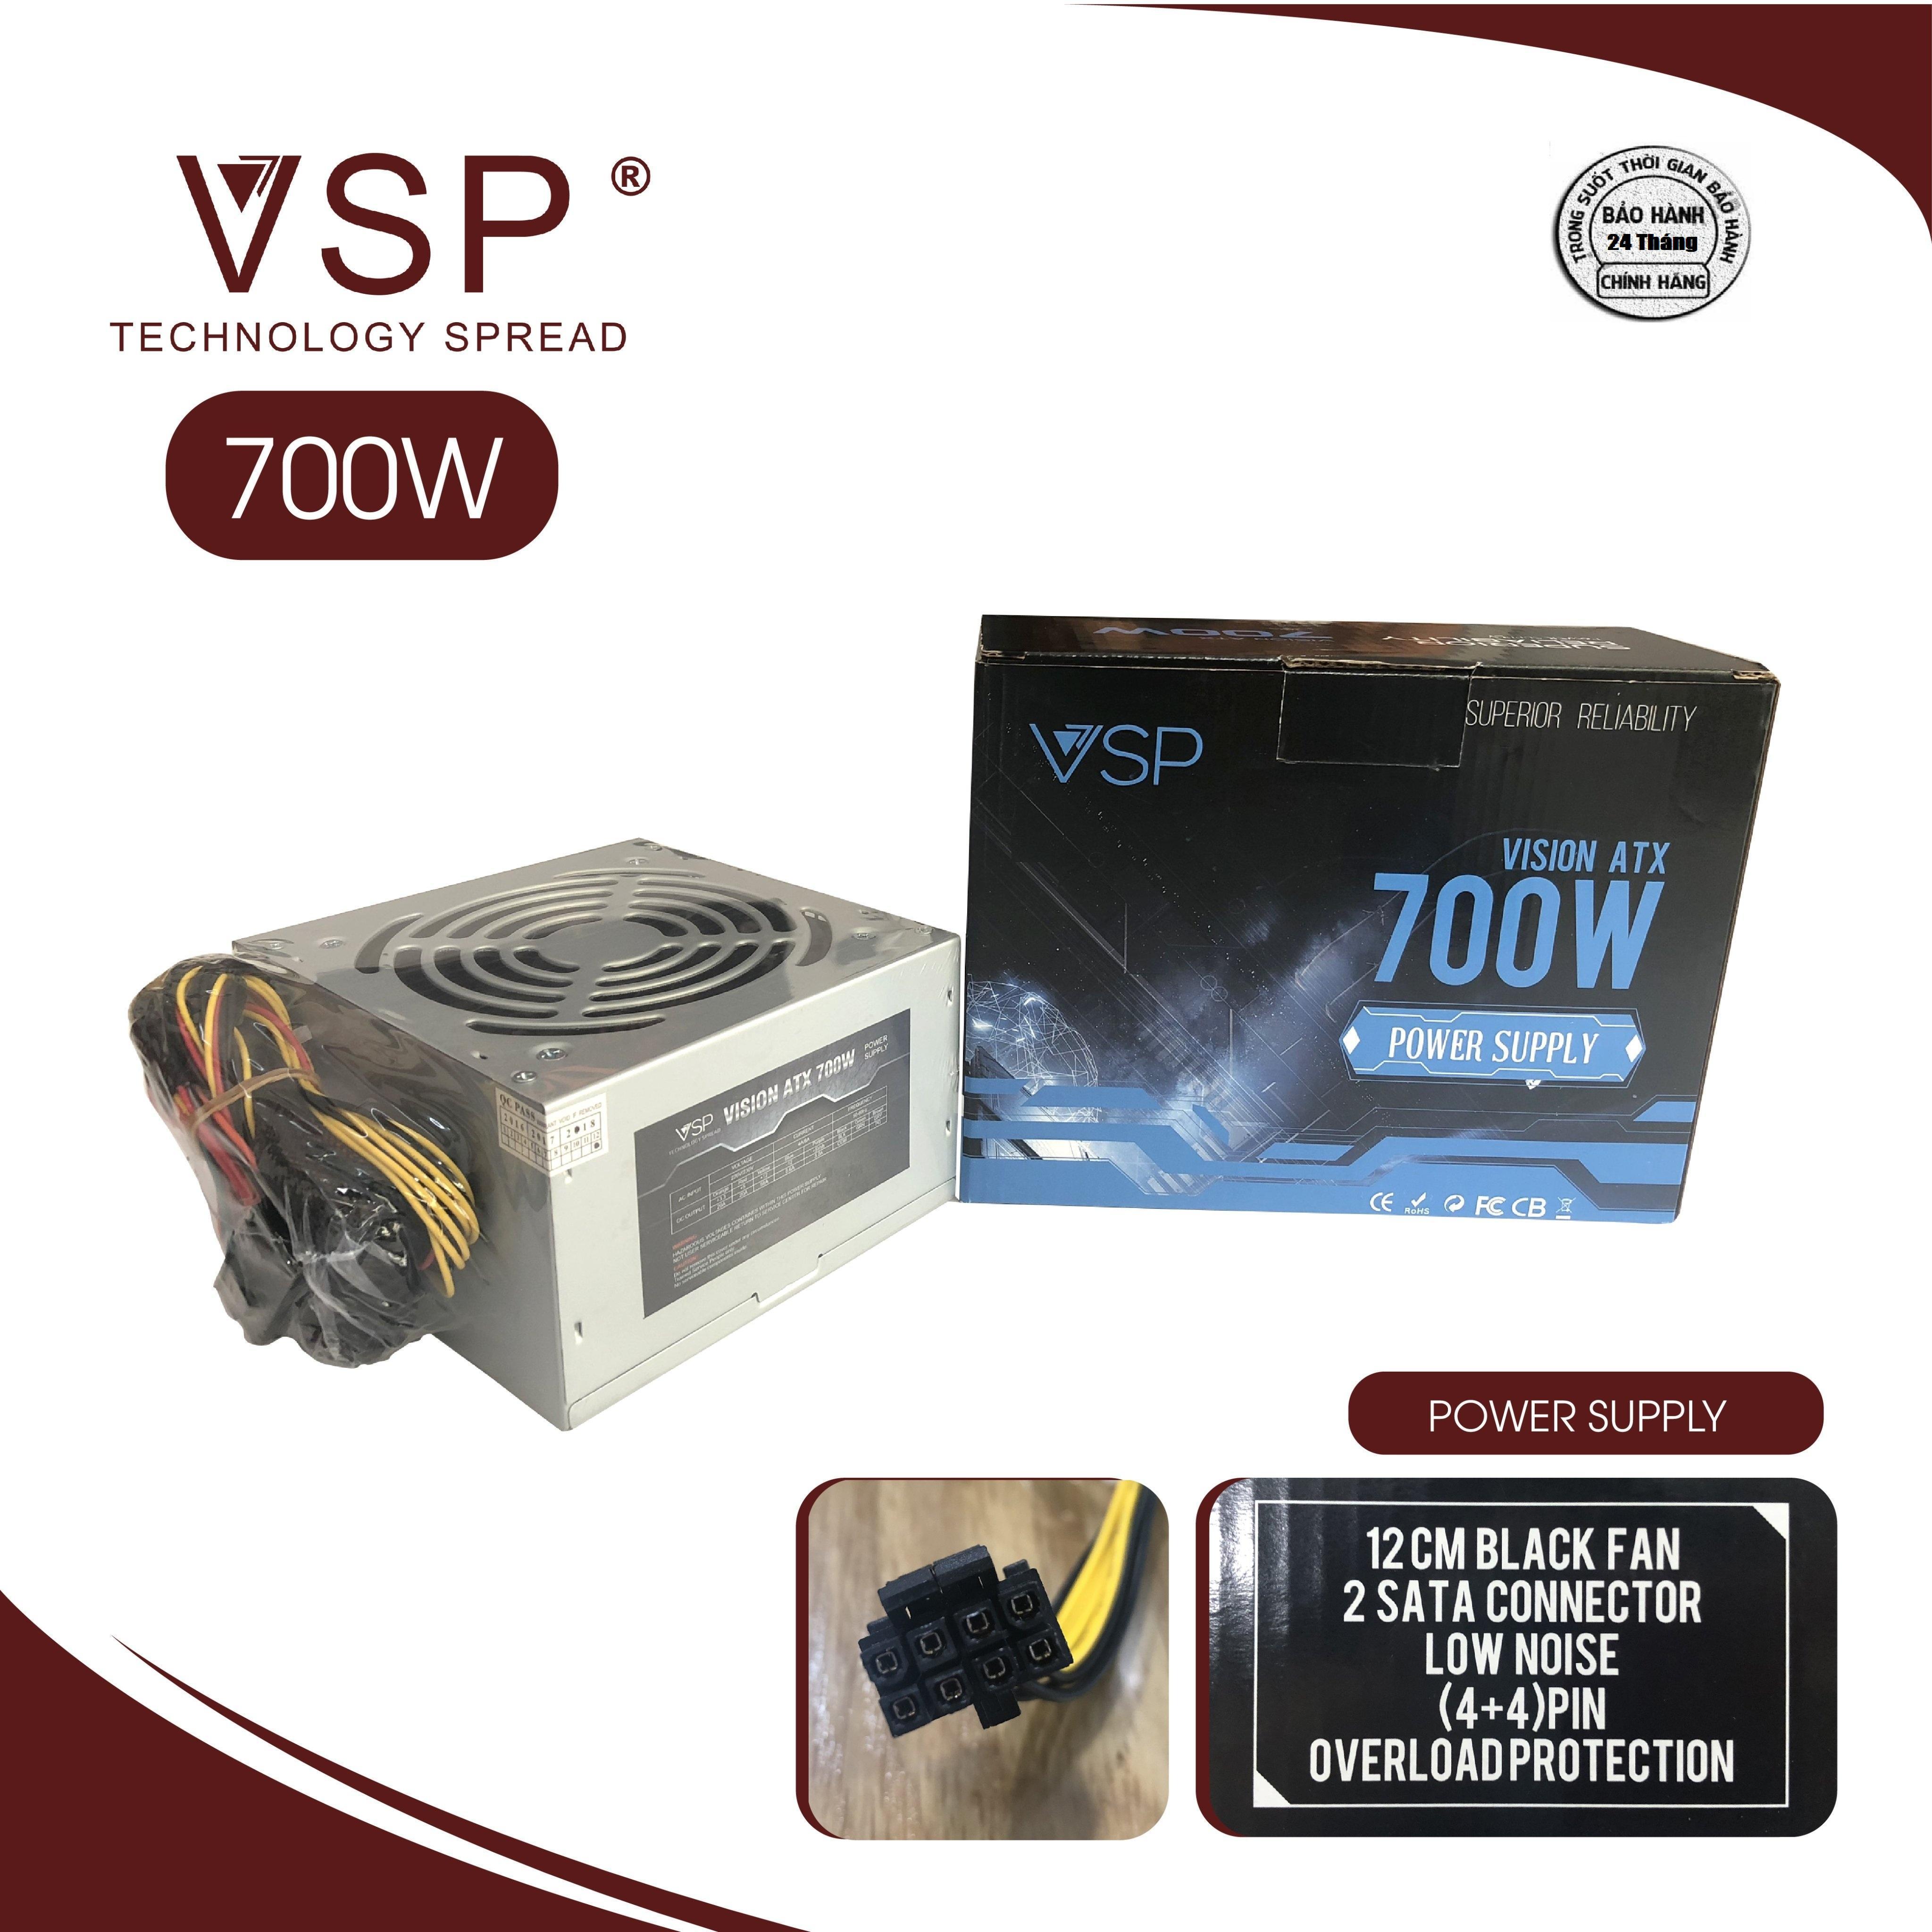 Giá VSP 700W- Full box